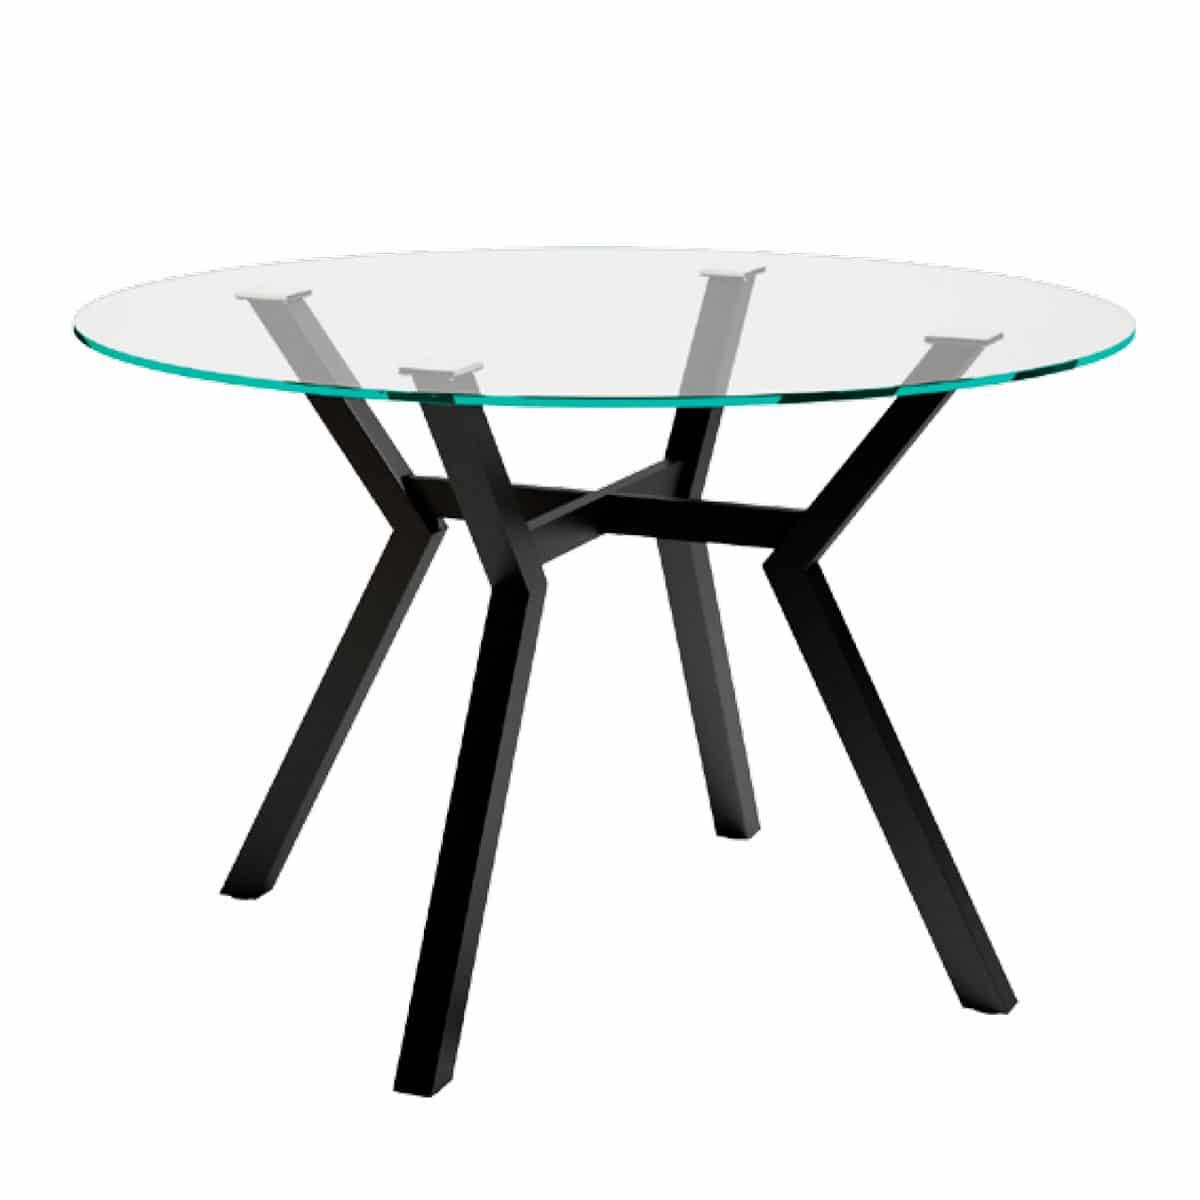 Mesa comedor redonda metal - Artikalia - Muebles de diseño